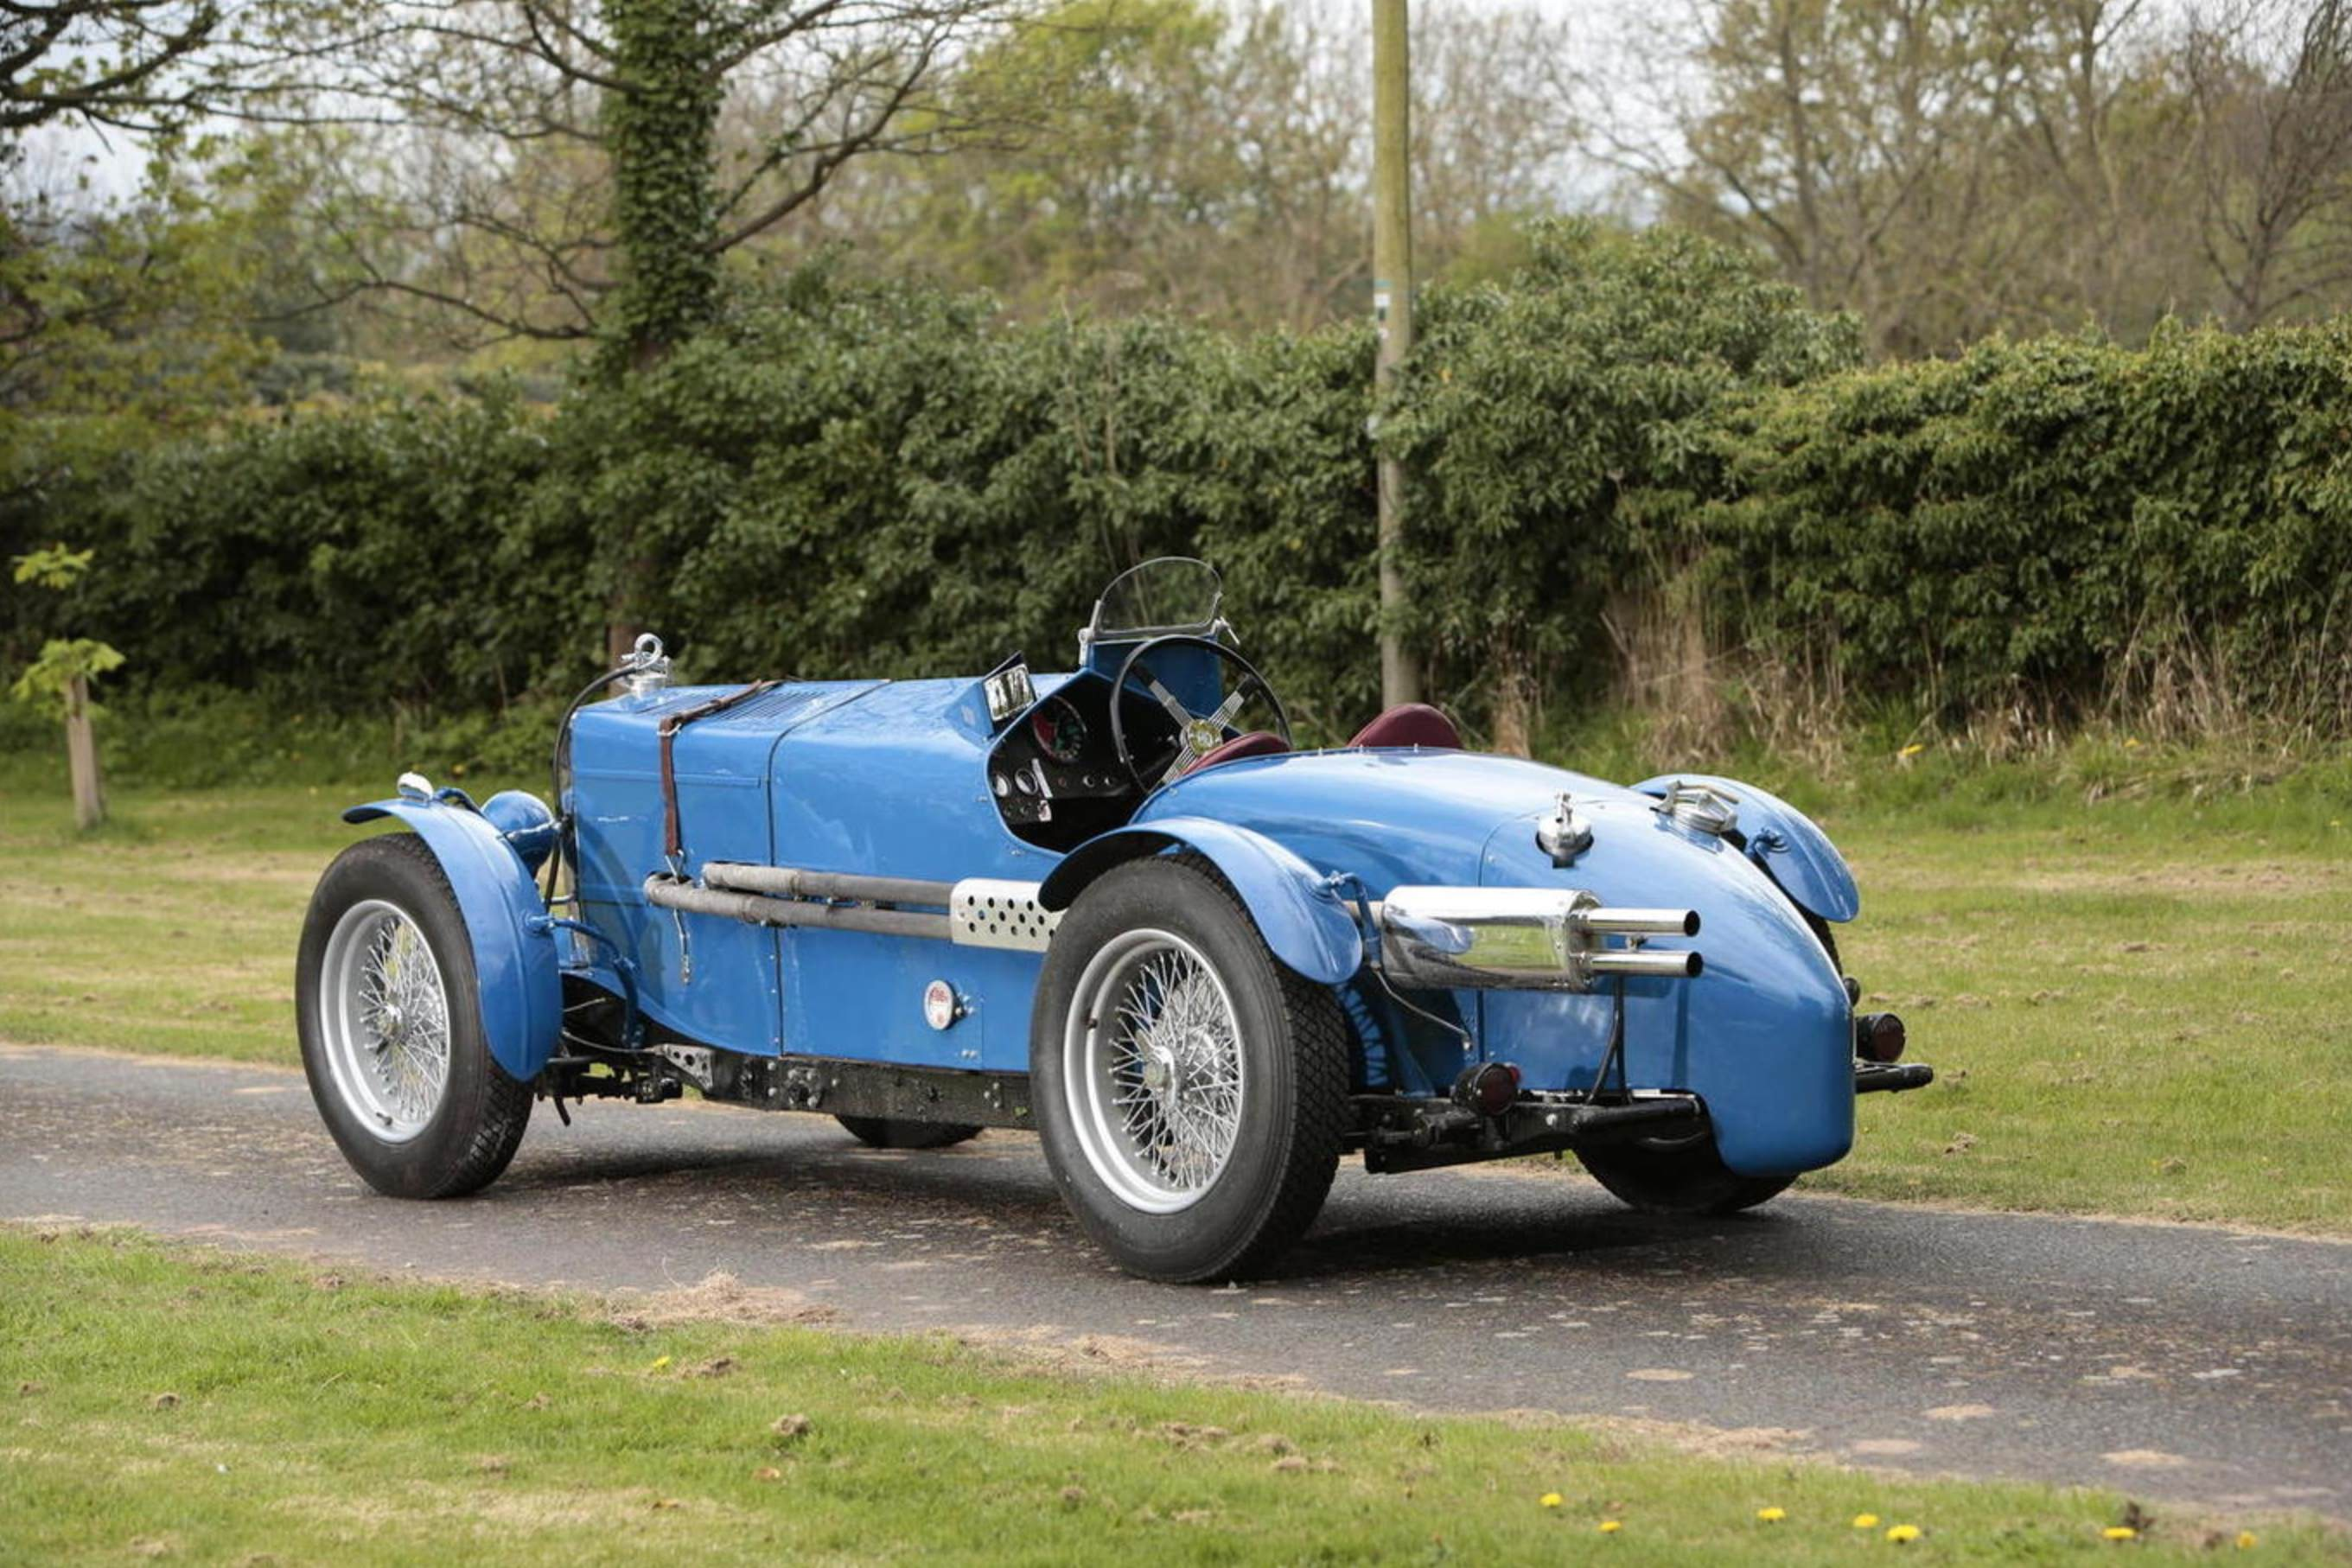 Vintage Race Car For Sale Uk